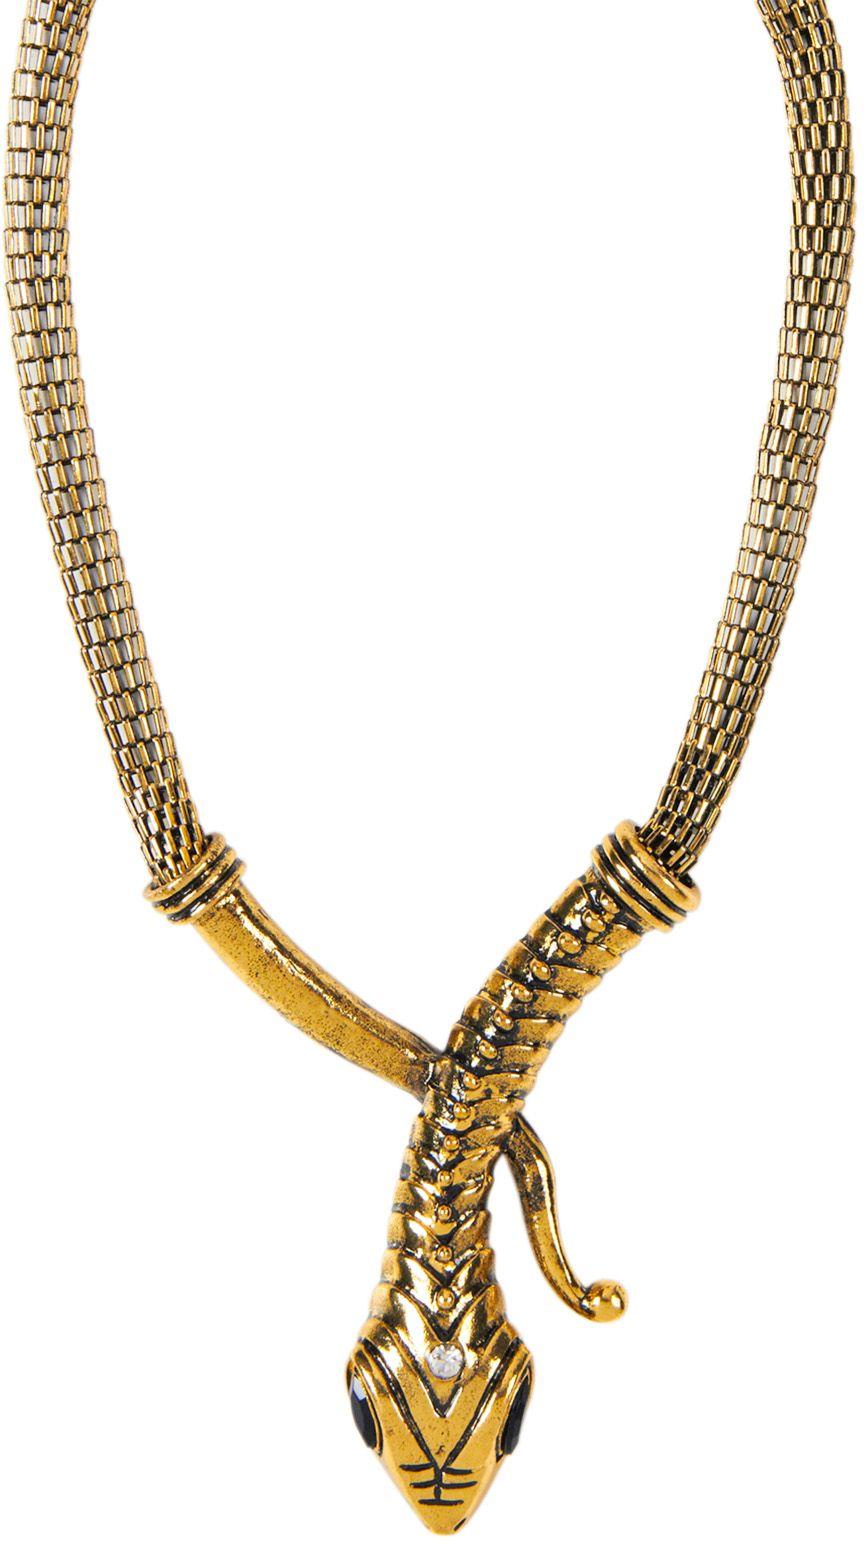 Slangen ketting